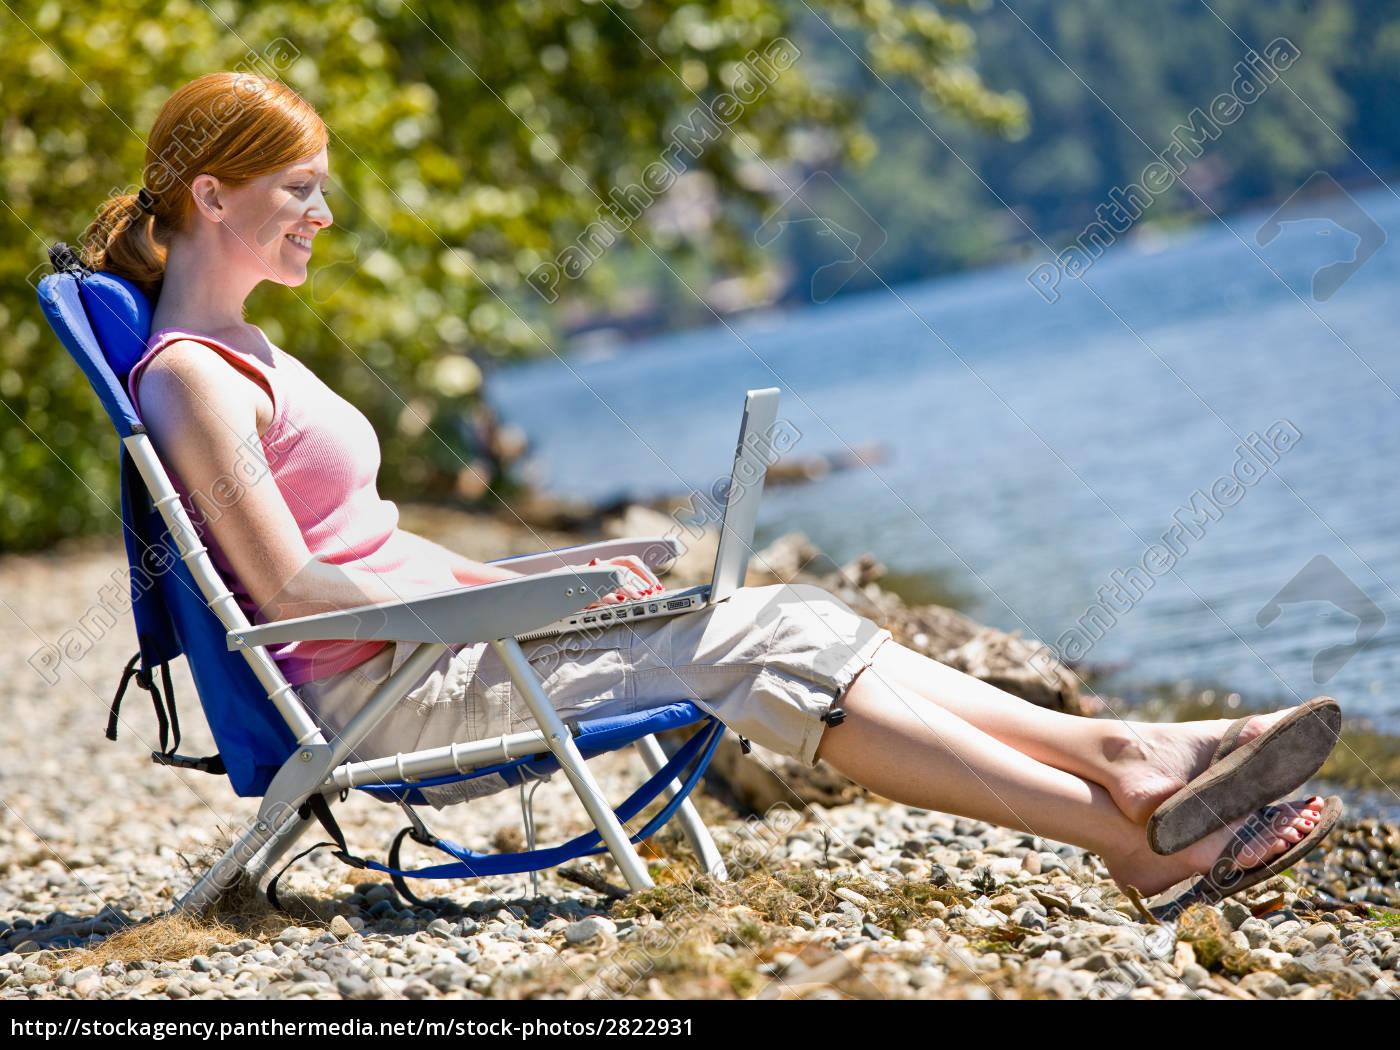 woman, using, laptop, near, stream - 2822931